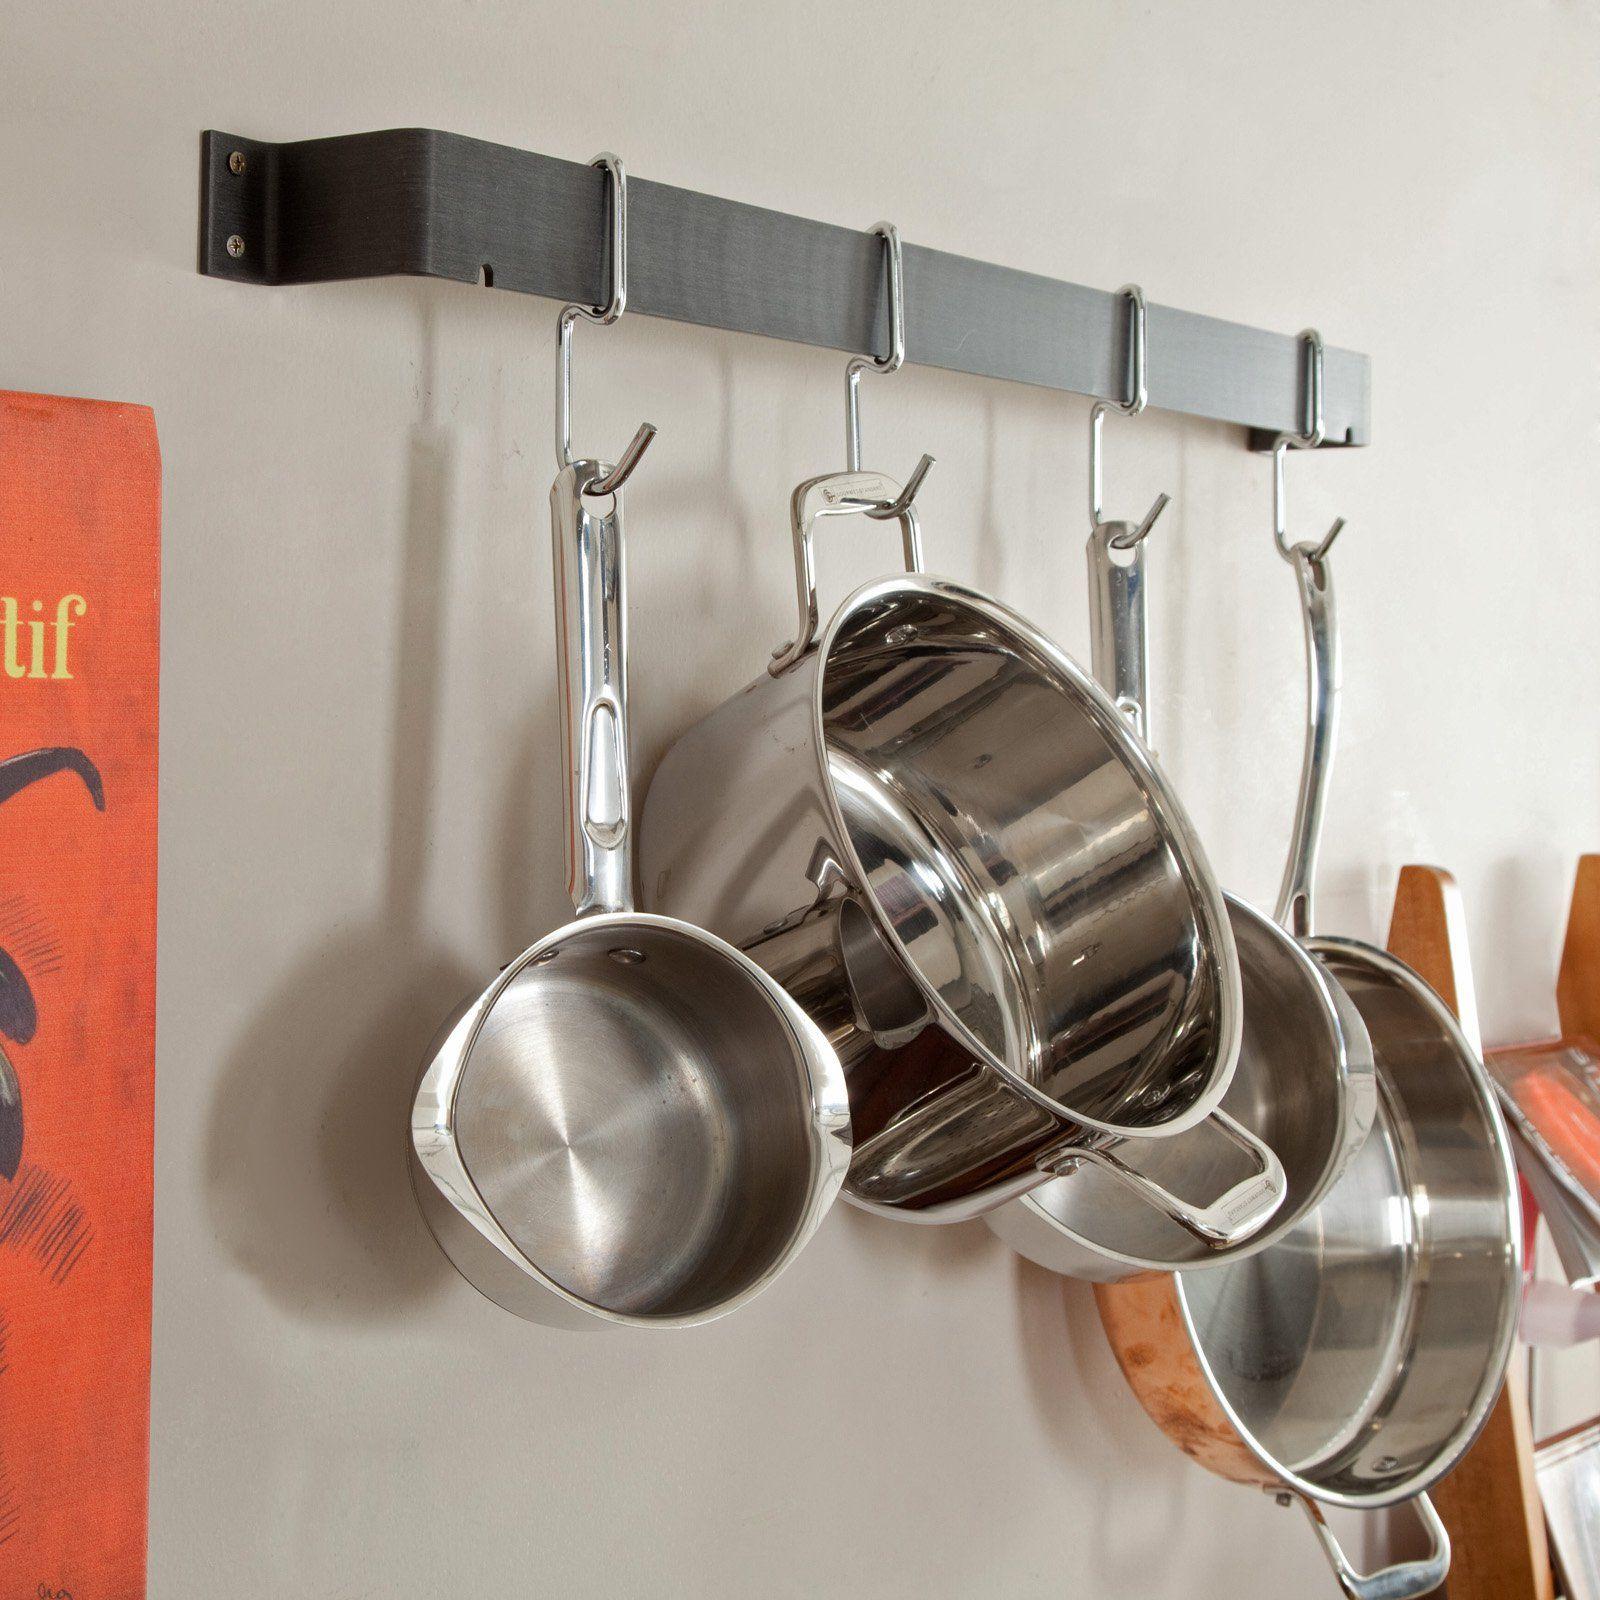 Calphalon 32-in. Straight Wall Pot Rack | Kitchen wall ...